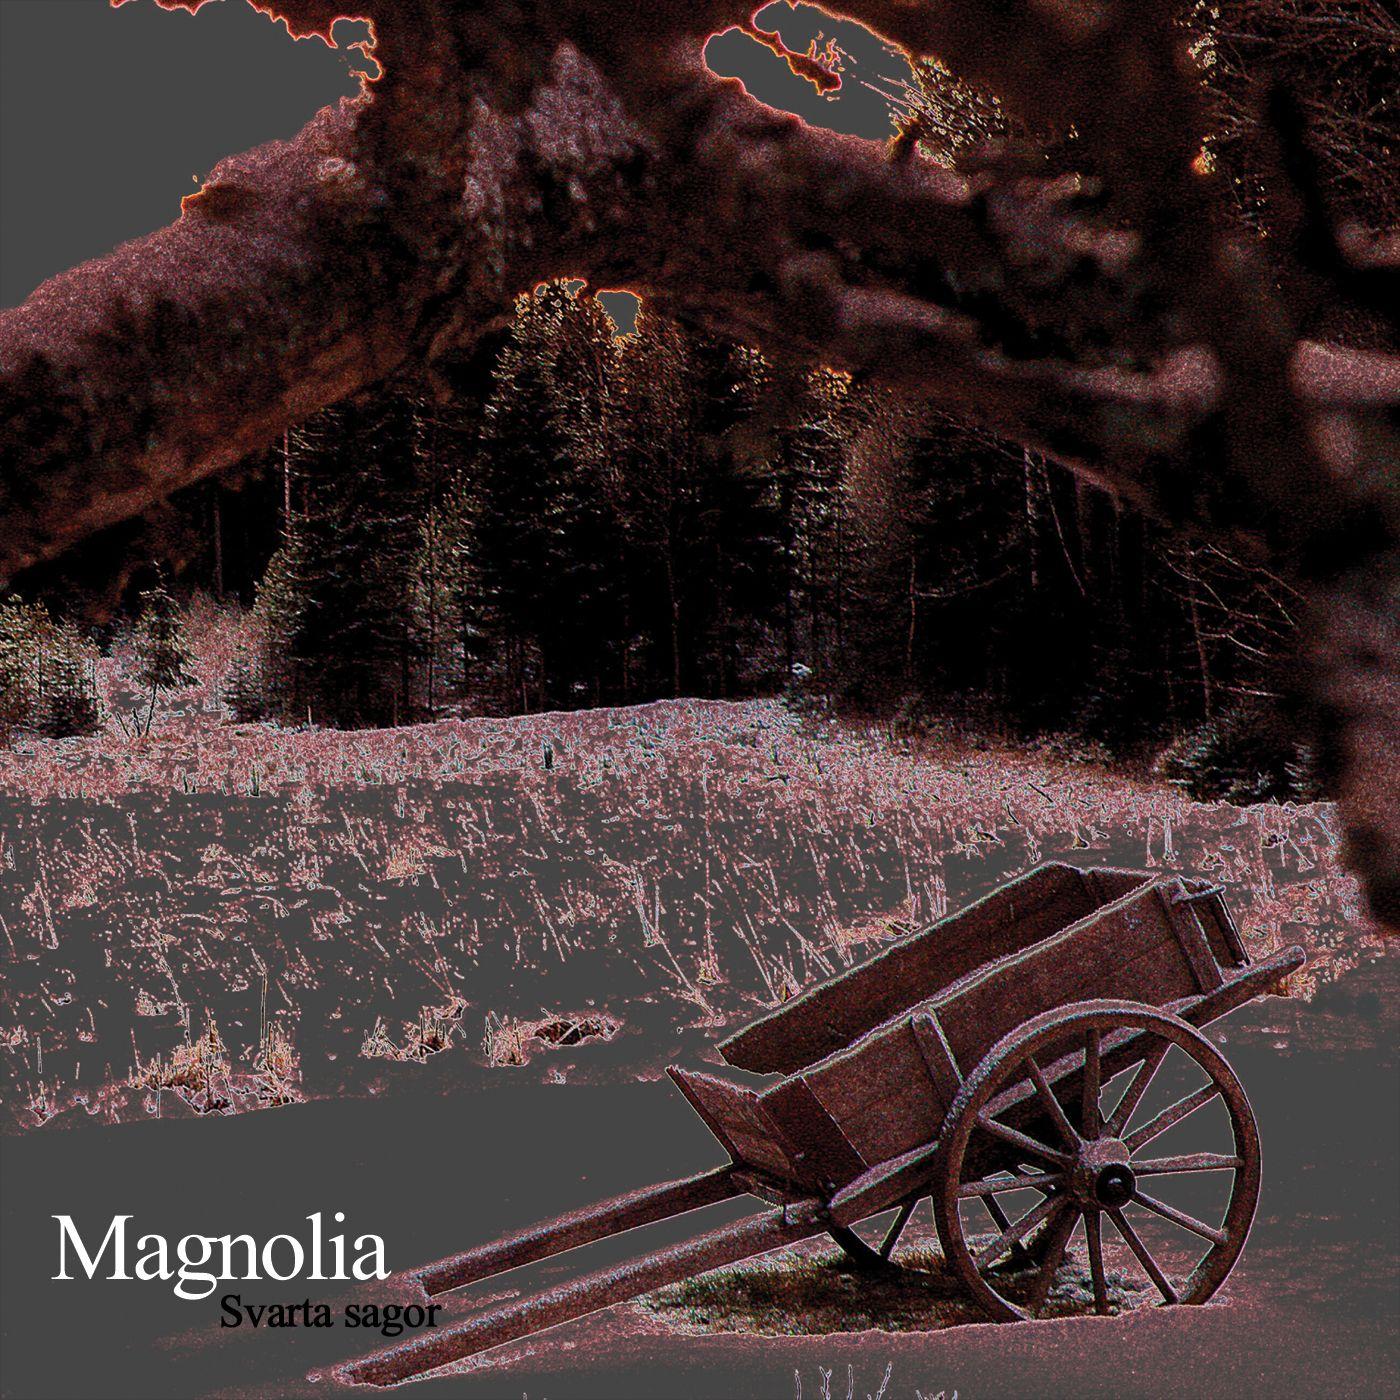 Magnolia: Svarta Sagor (Transubstans); Suecia